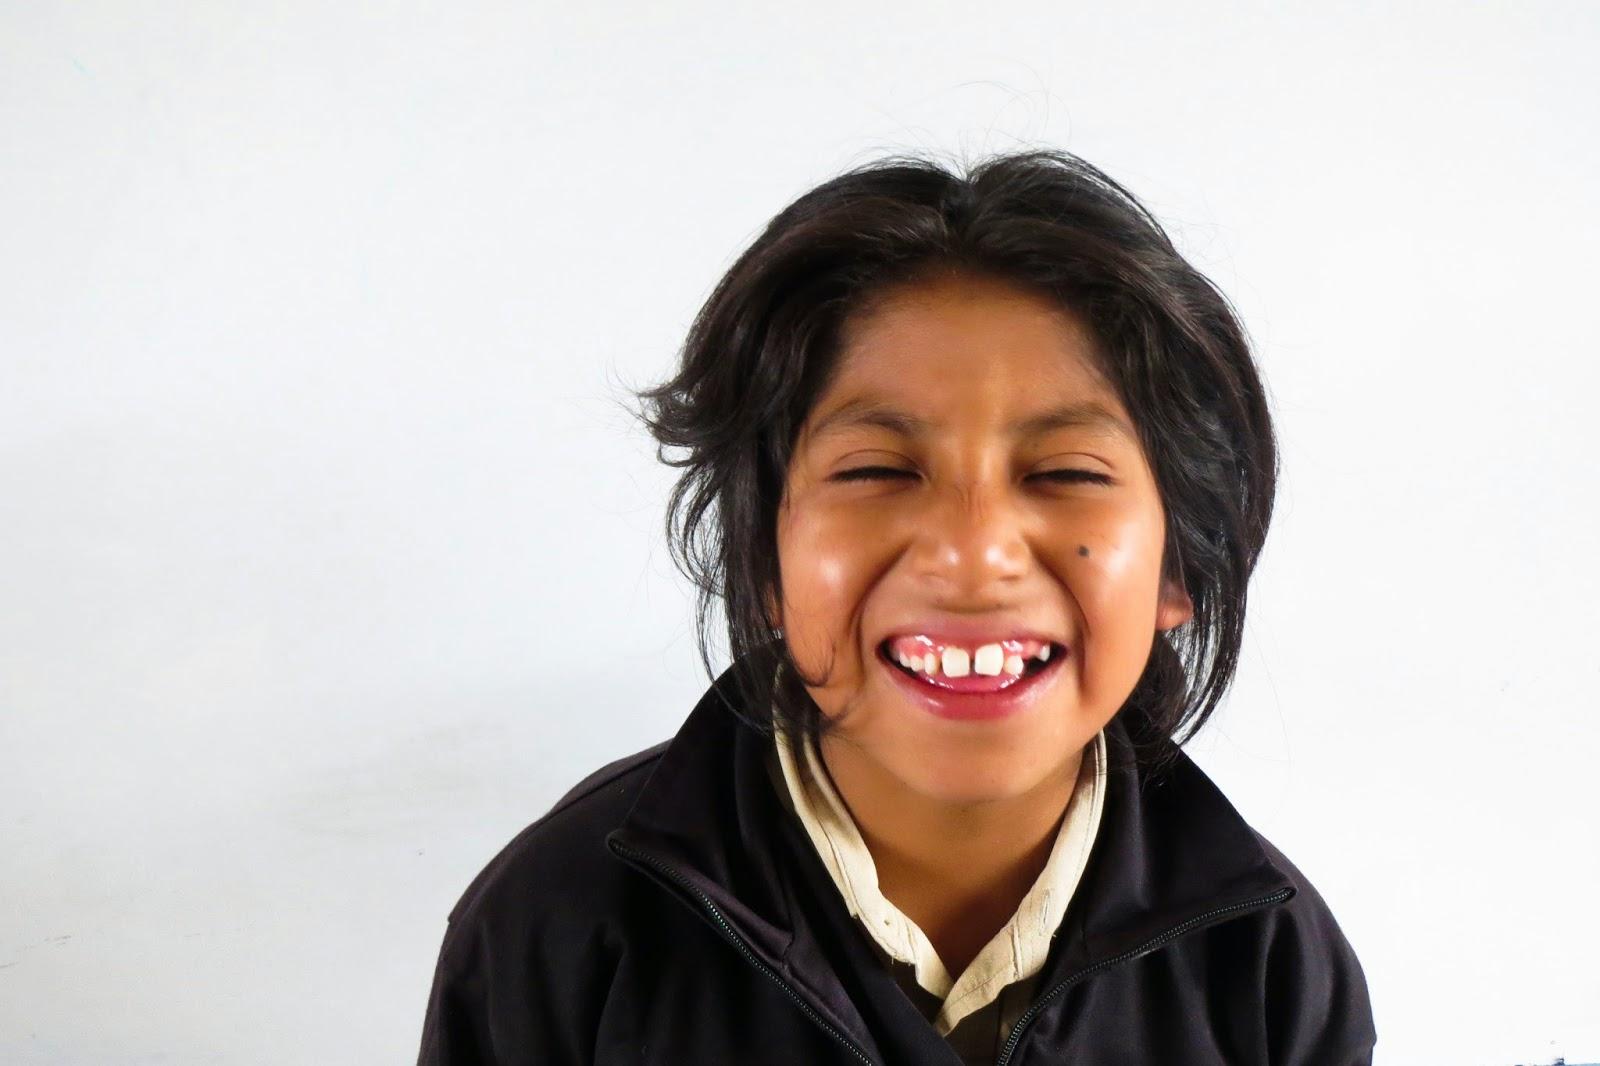 Wamari, Age 12